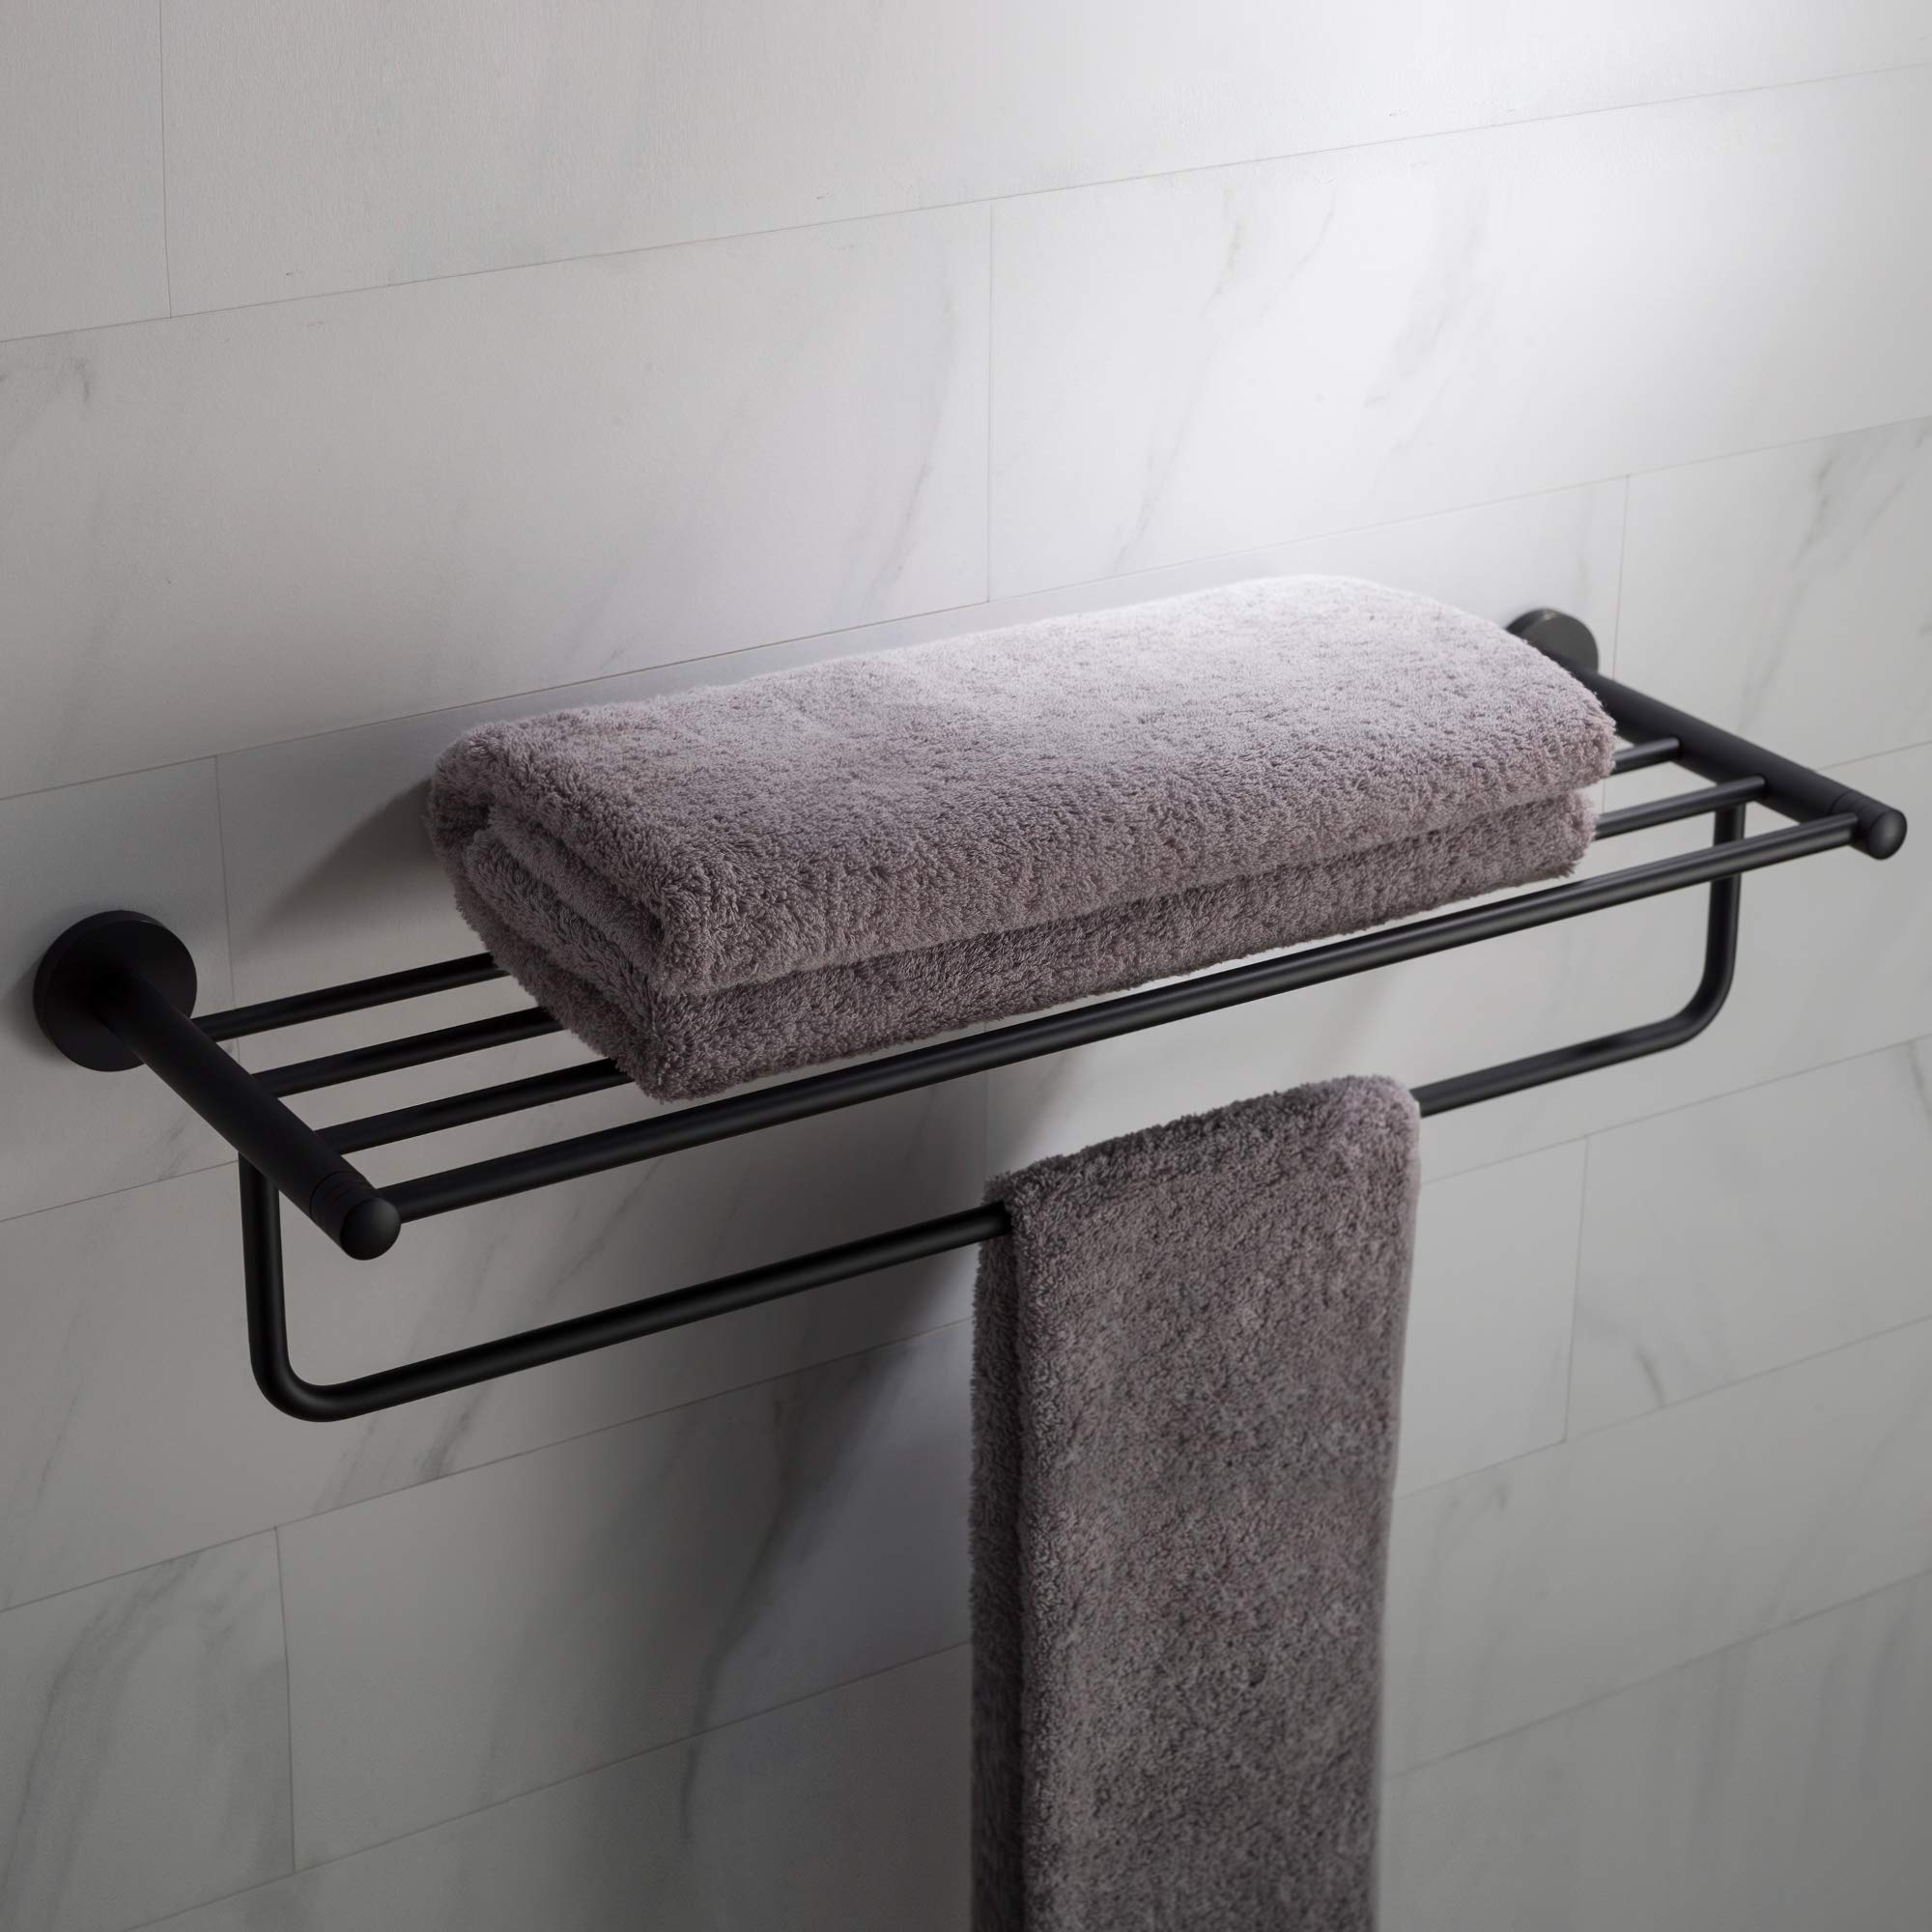 KRAUS Elie Bathroom Shelf with Towel Bar, Matte Black Finish, KEA-18842MB by Kraus (Image #1)